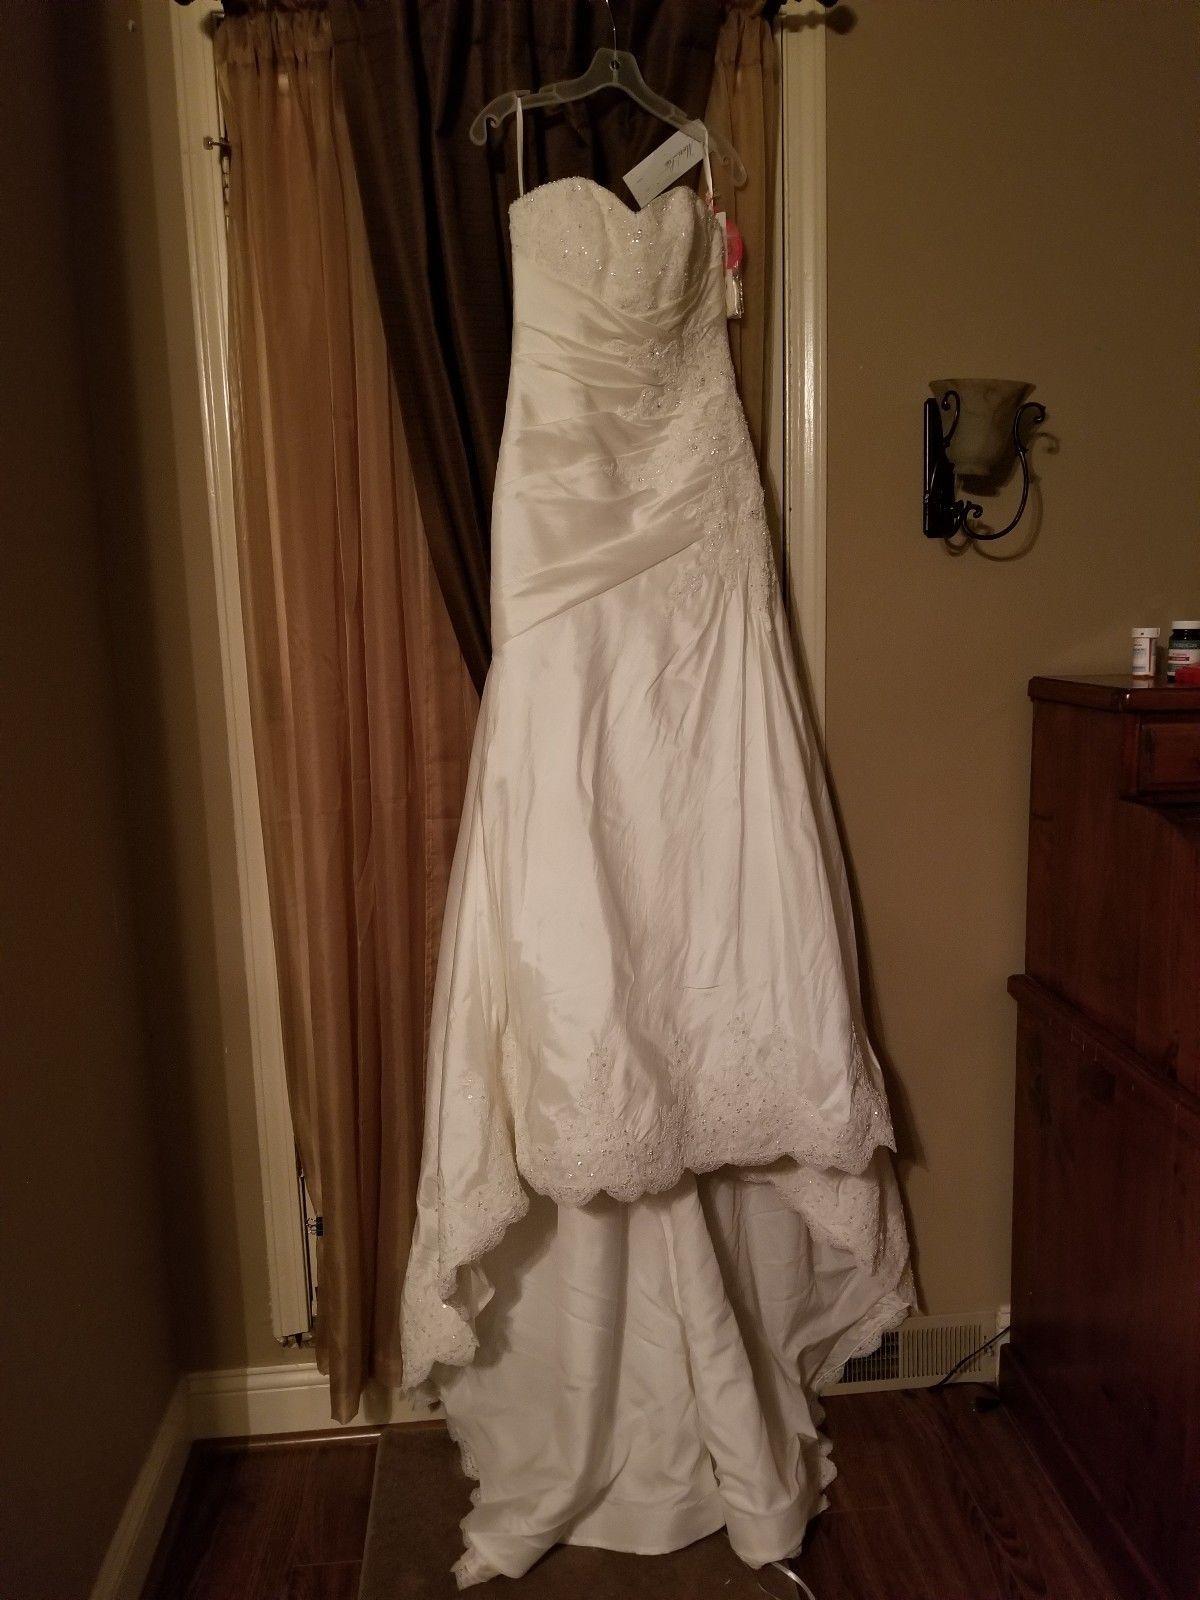 Size 8 wedding dress  wedding dress never worn never altered brand is Maori lee size